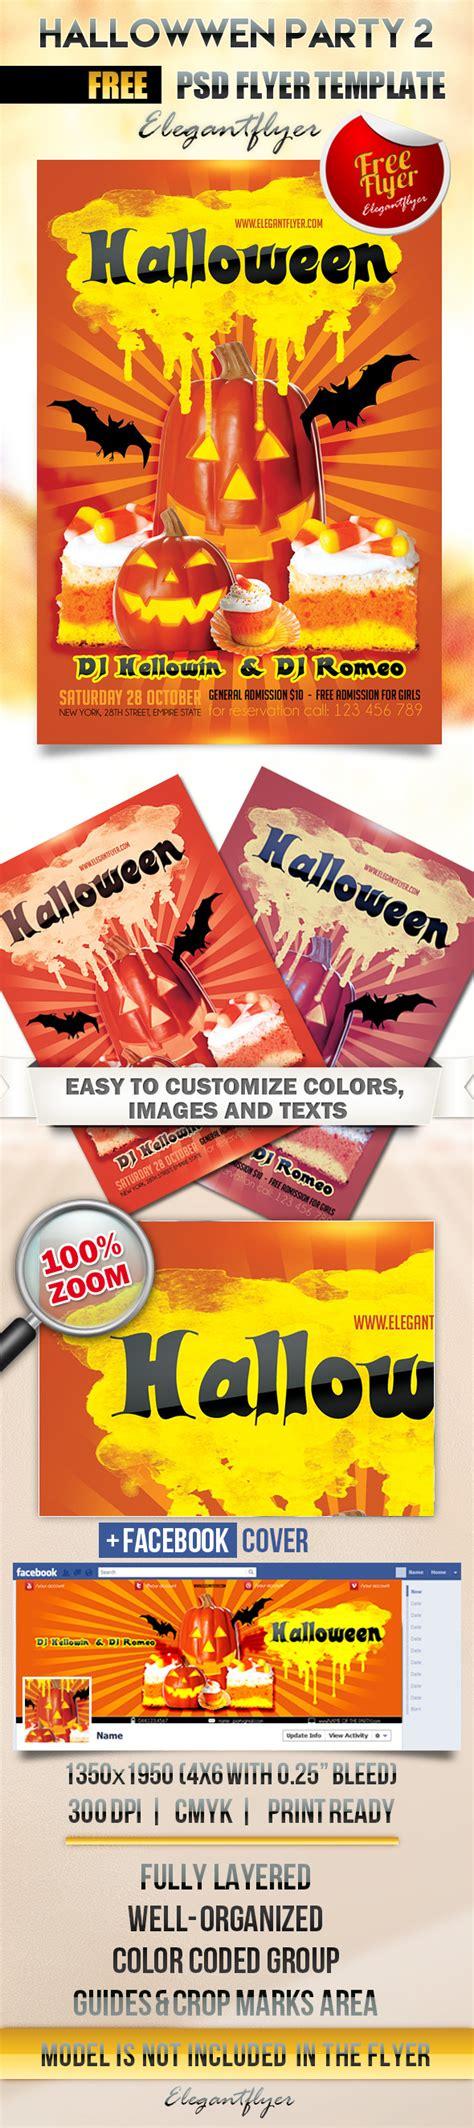 20 Free Psd Halloween Flyer Templates Free Psd Templates Flyer Template Psd 2